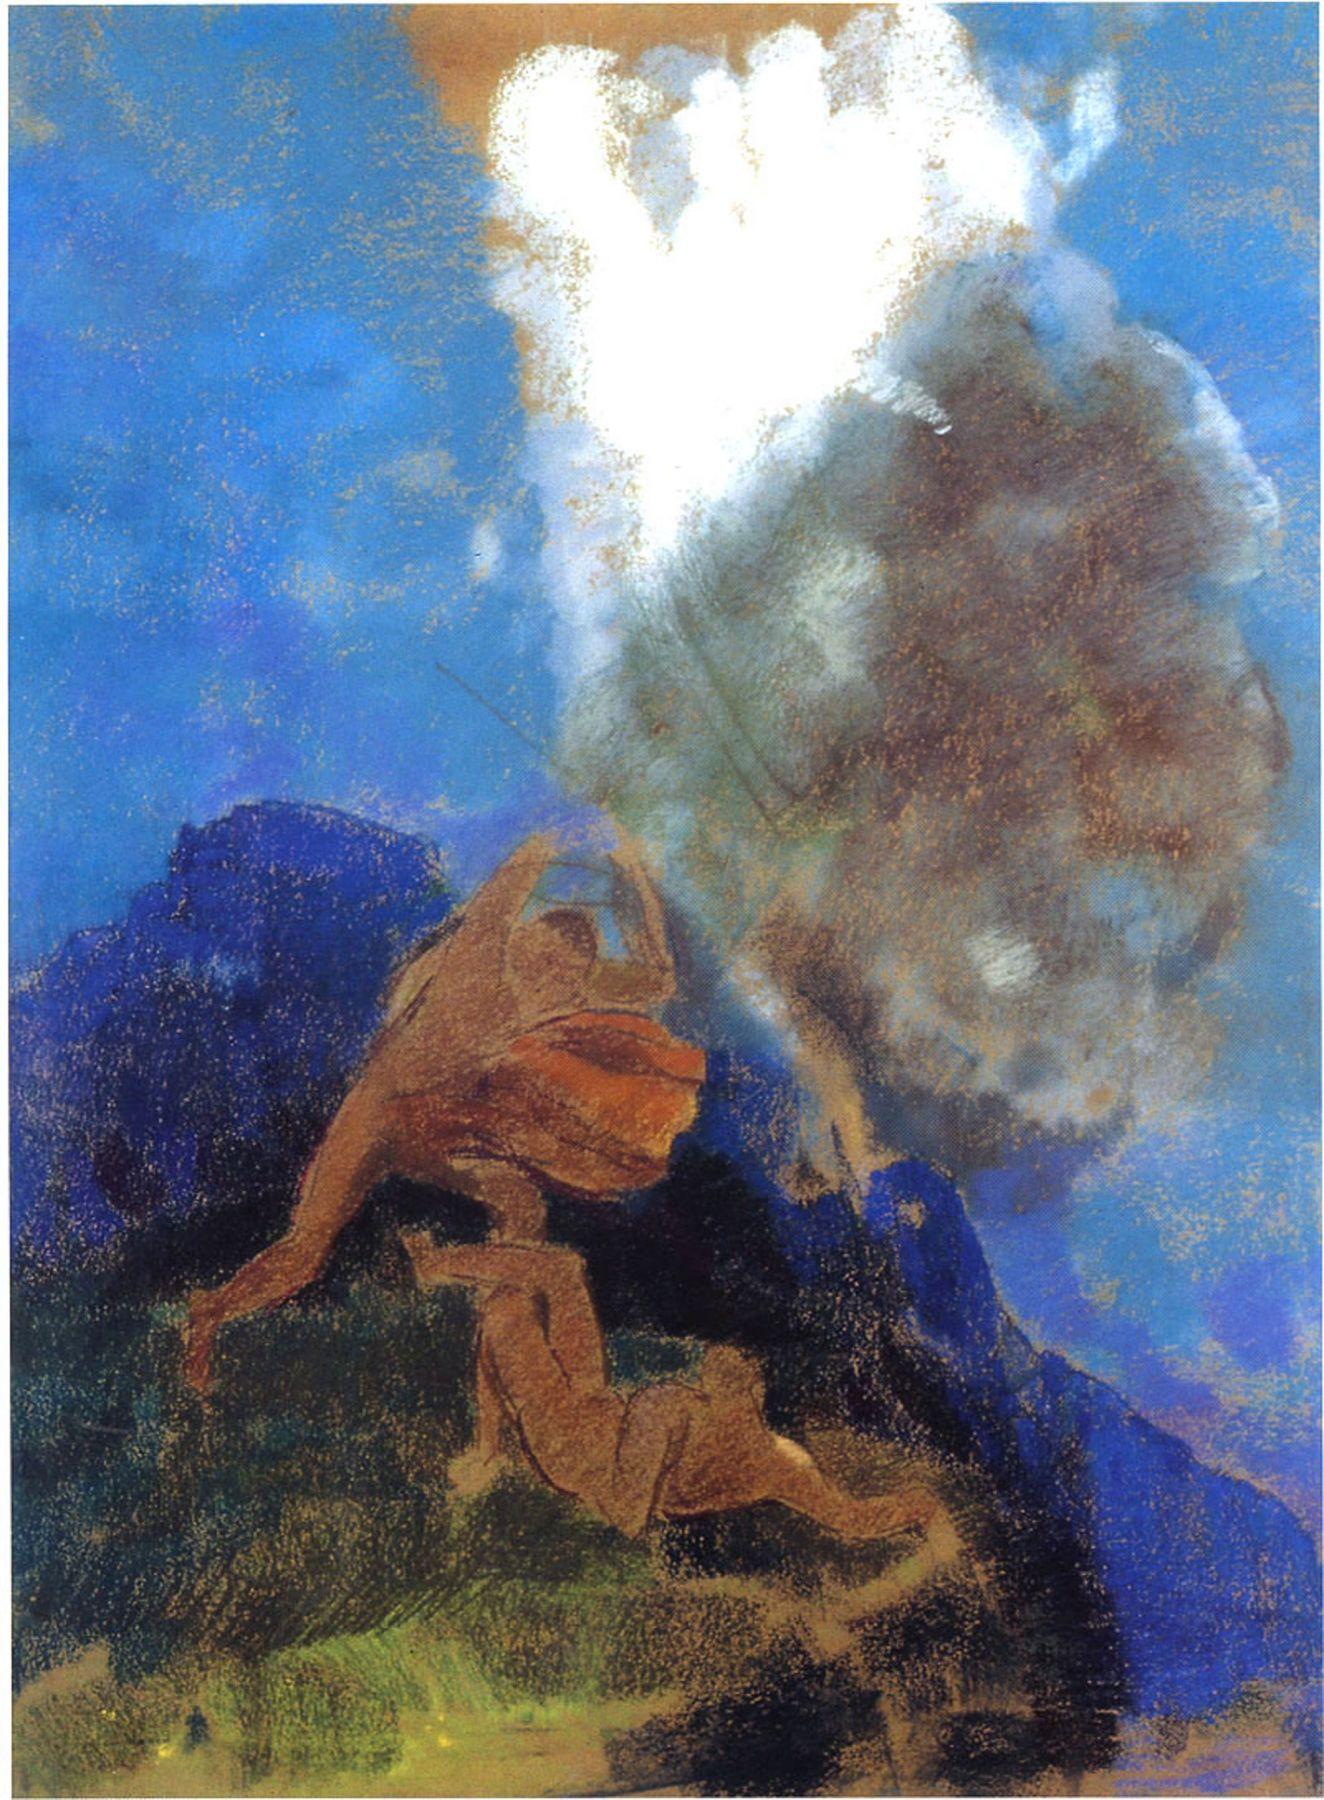 Odillon Redon, Caïn et Abel Pastel on Bistre paper 80 x 60 cm. (31 1/2 x 23.6 in.)